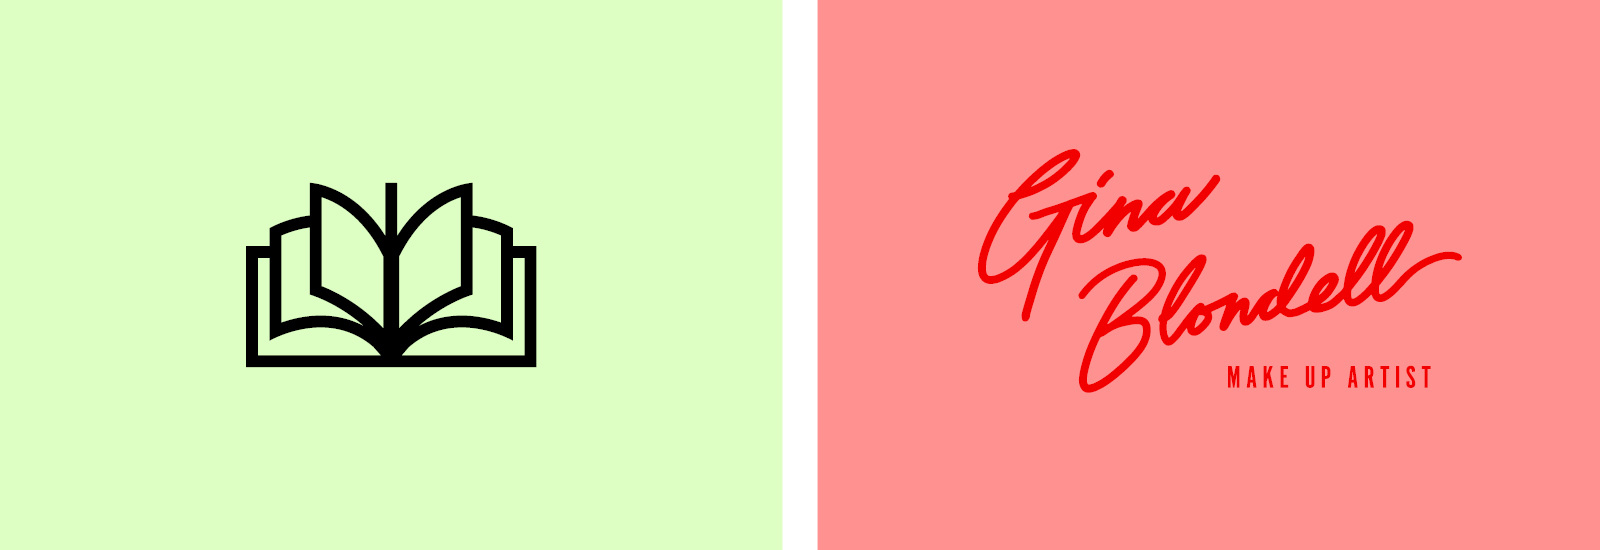 various logos guy field